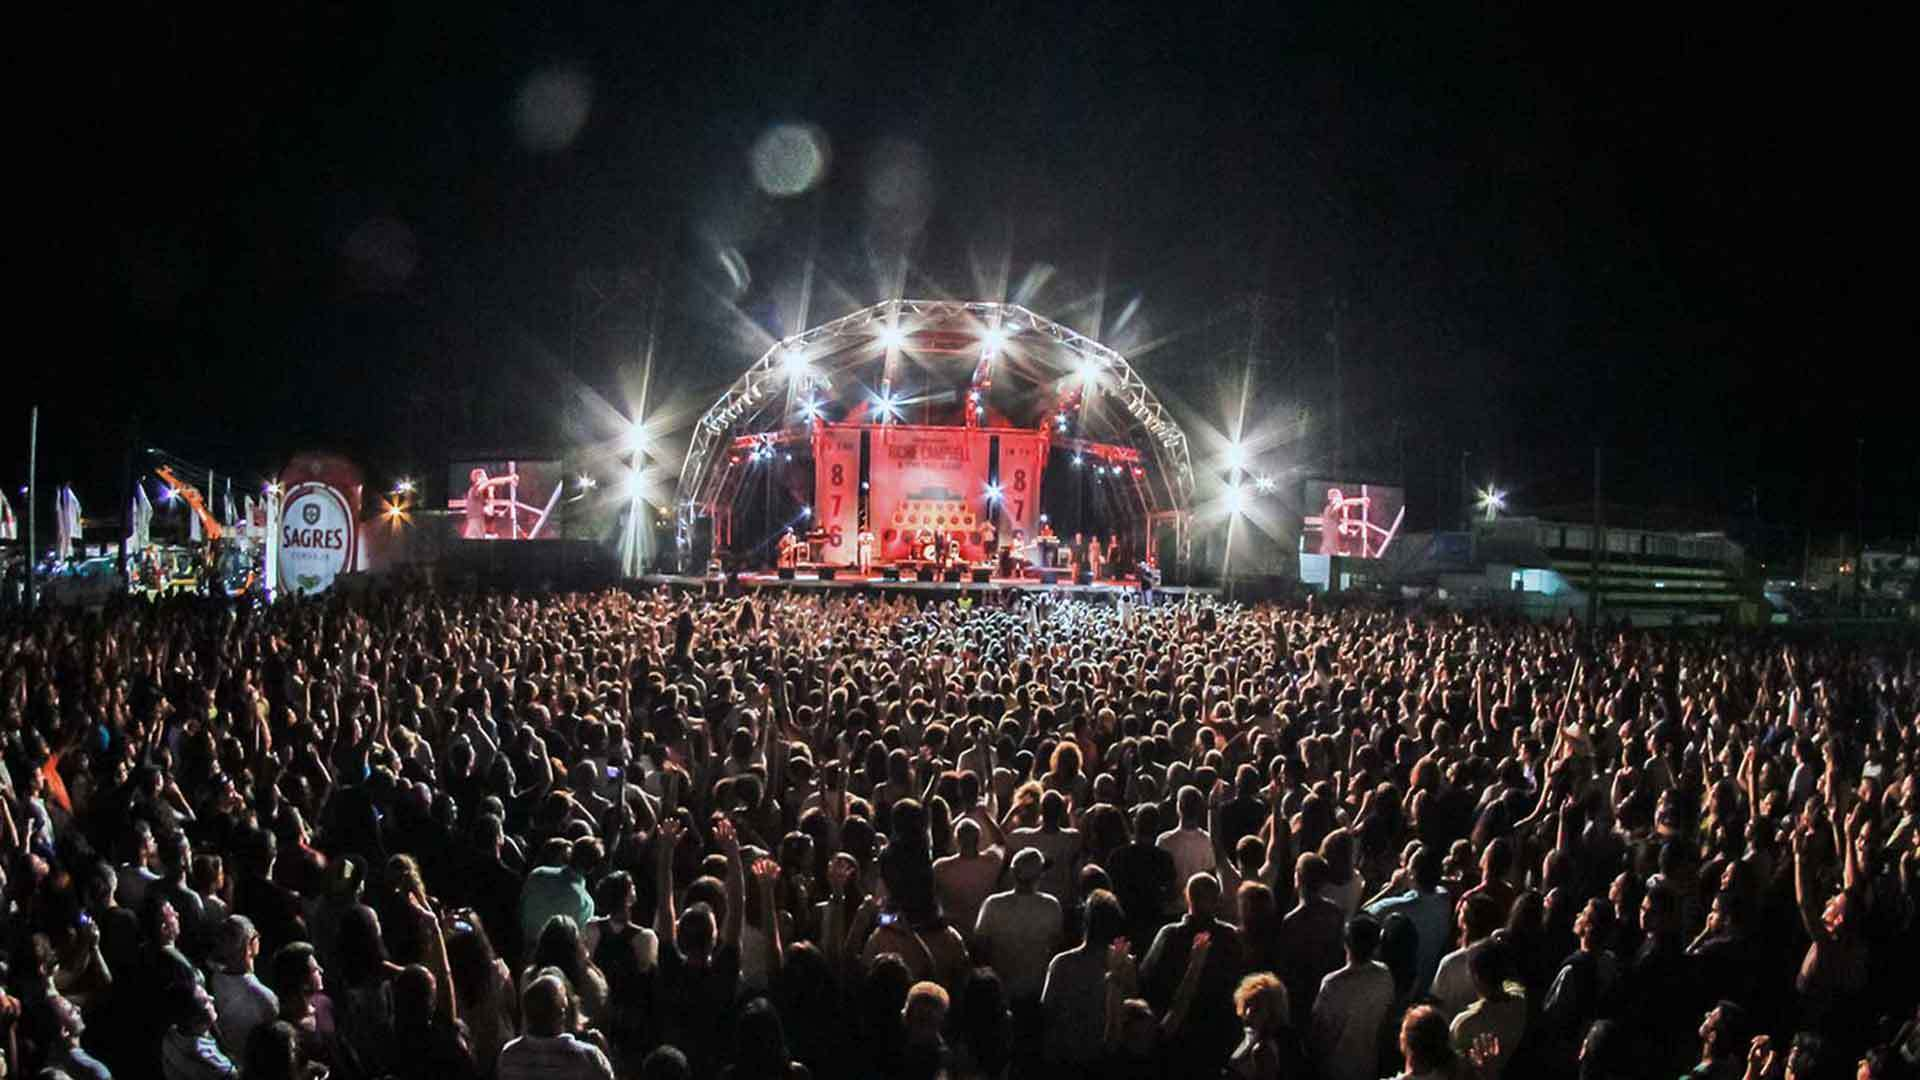 Fatacil: The Algarve's best summer festivity